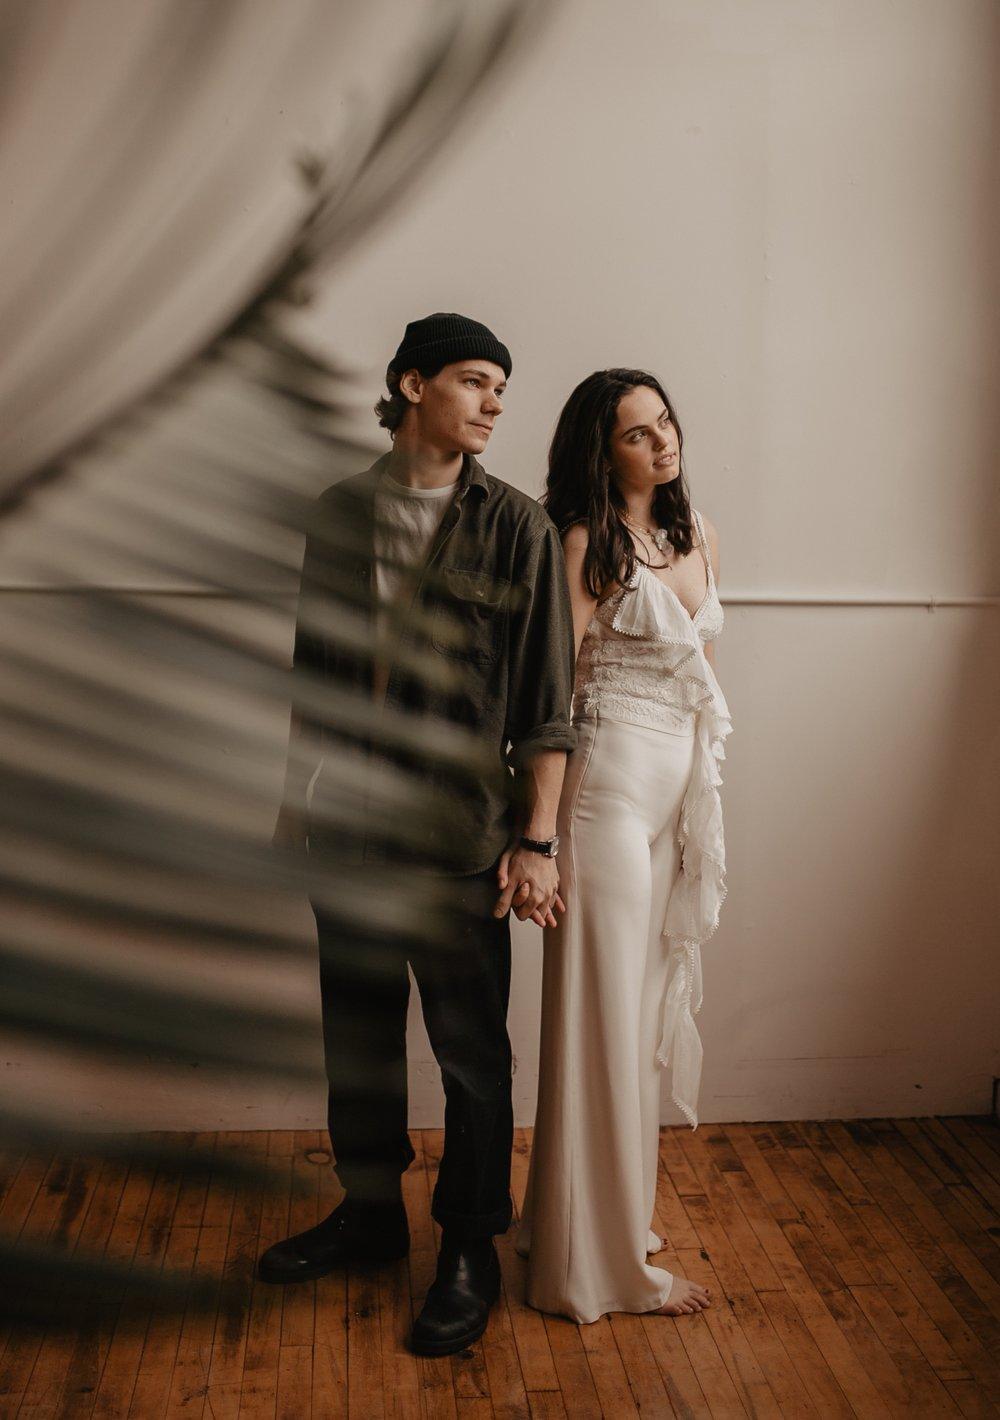 20_minimal.tps-35_unique_Claire_Faye_dress_studio_Portland_trendy_Wedding_la.jpg